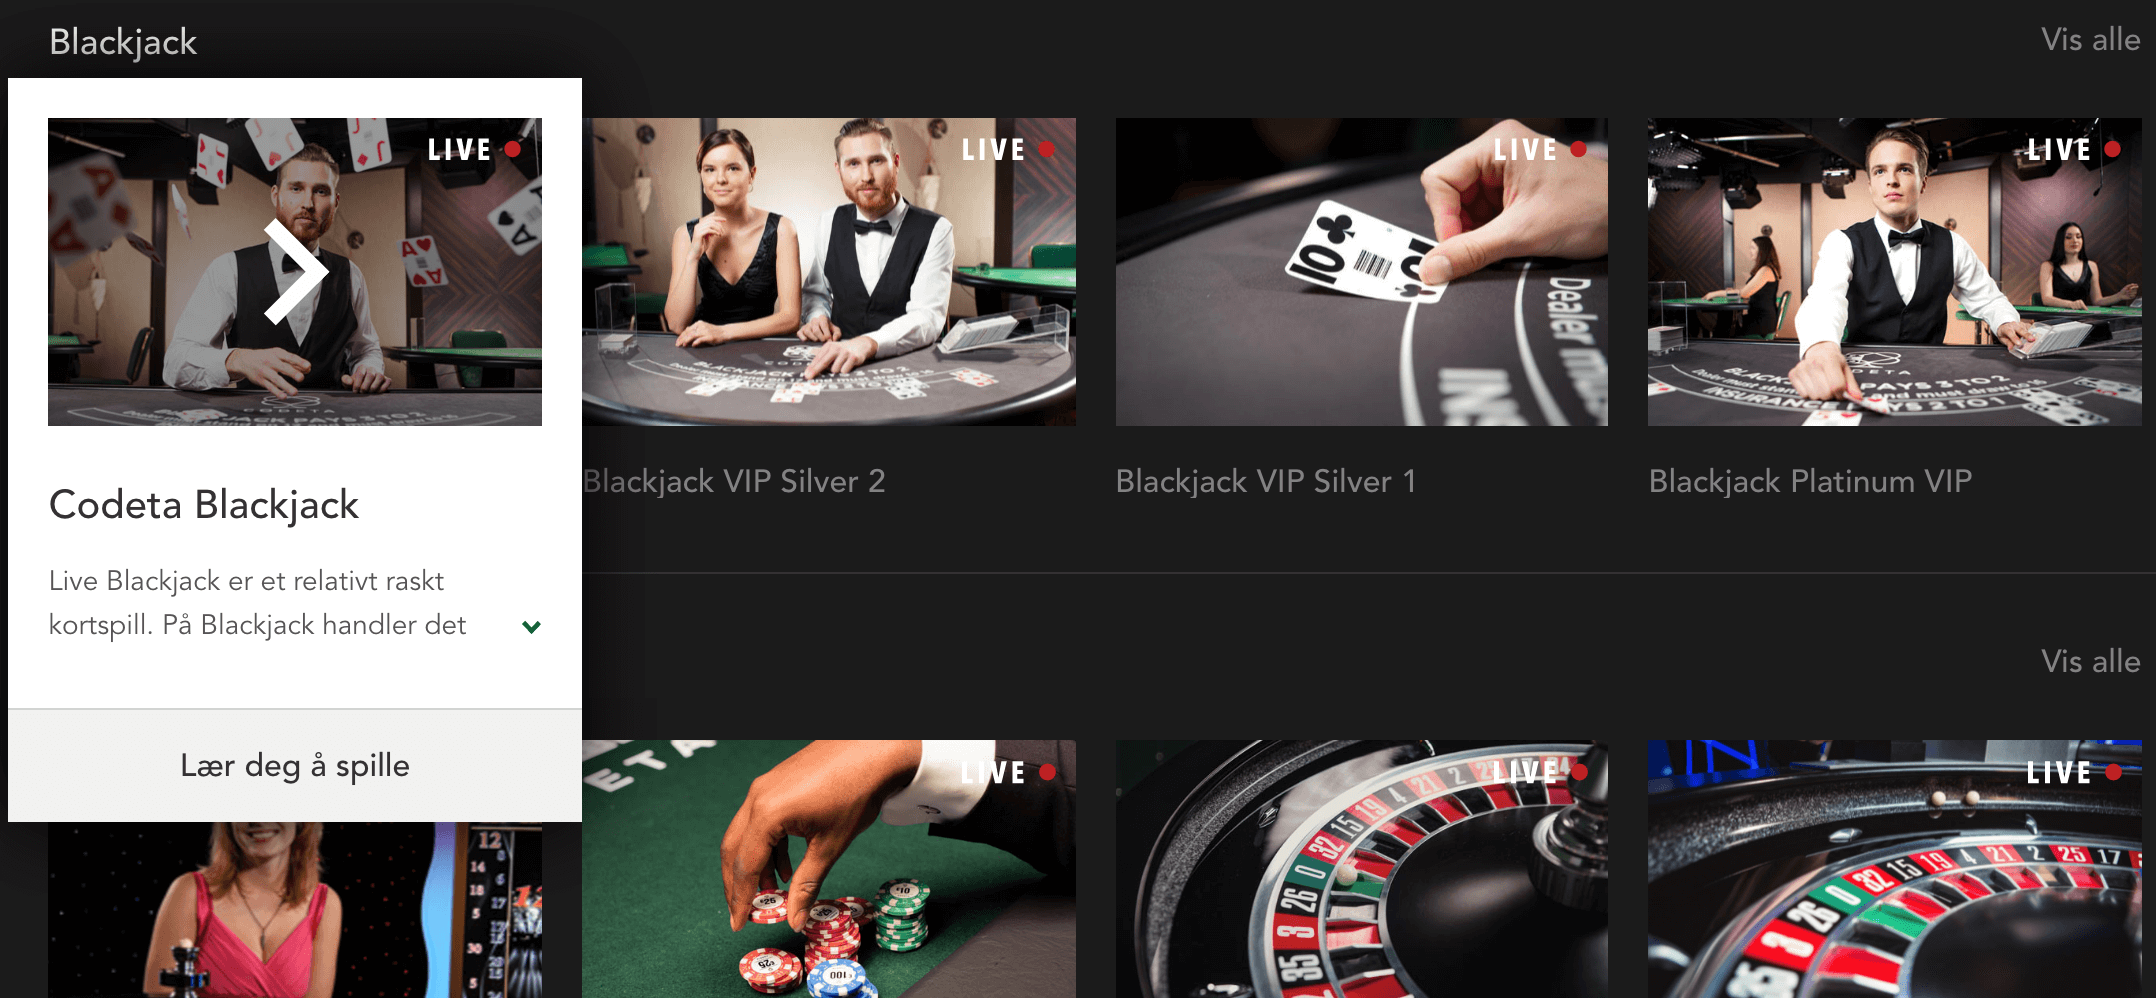 casino sitt eget spill